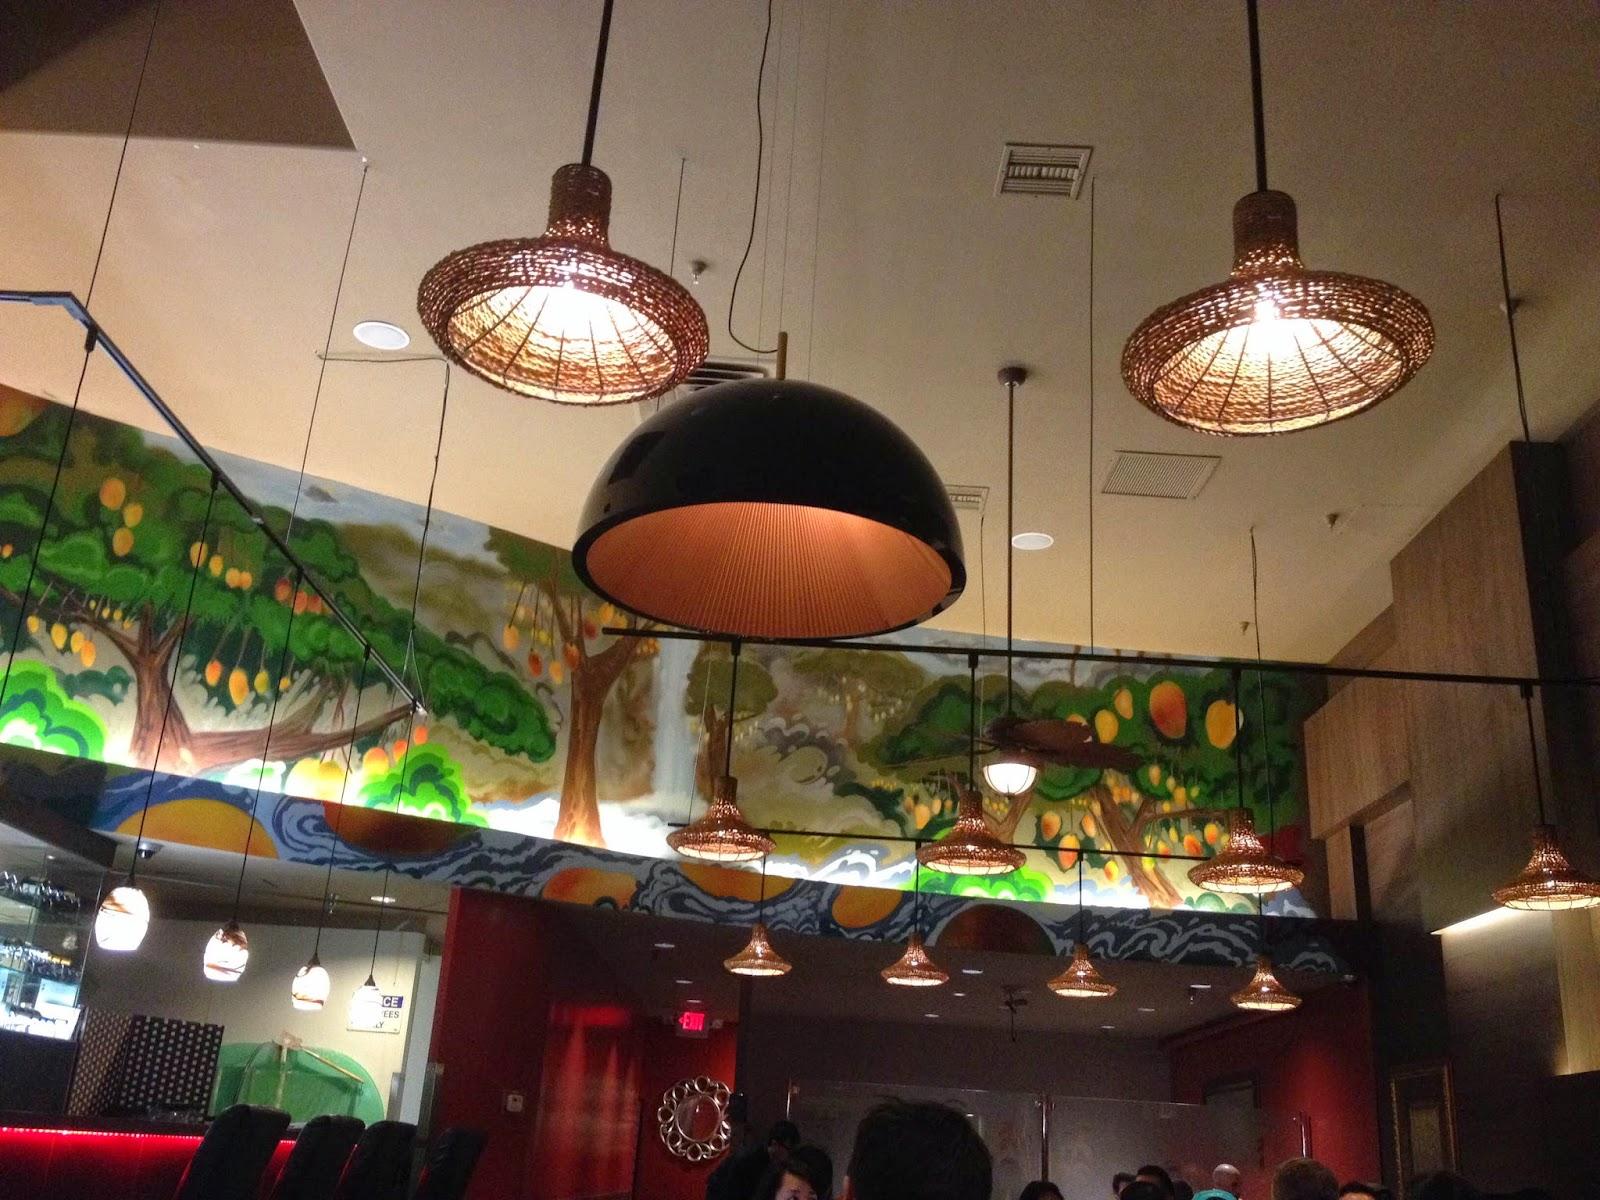 Spice And zest: Mango Garden (San Mateo) Review